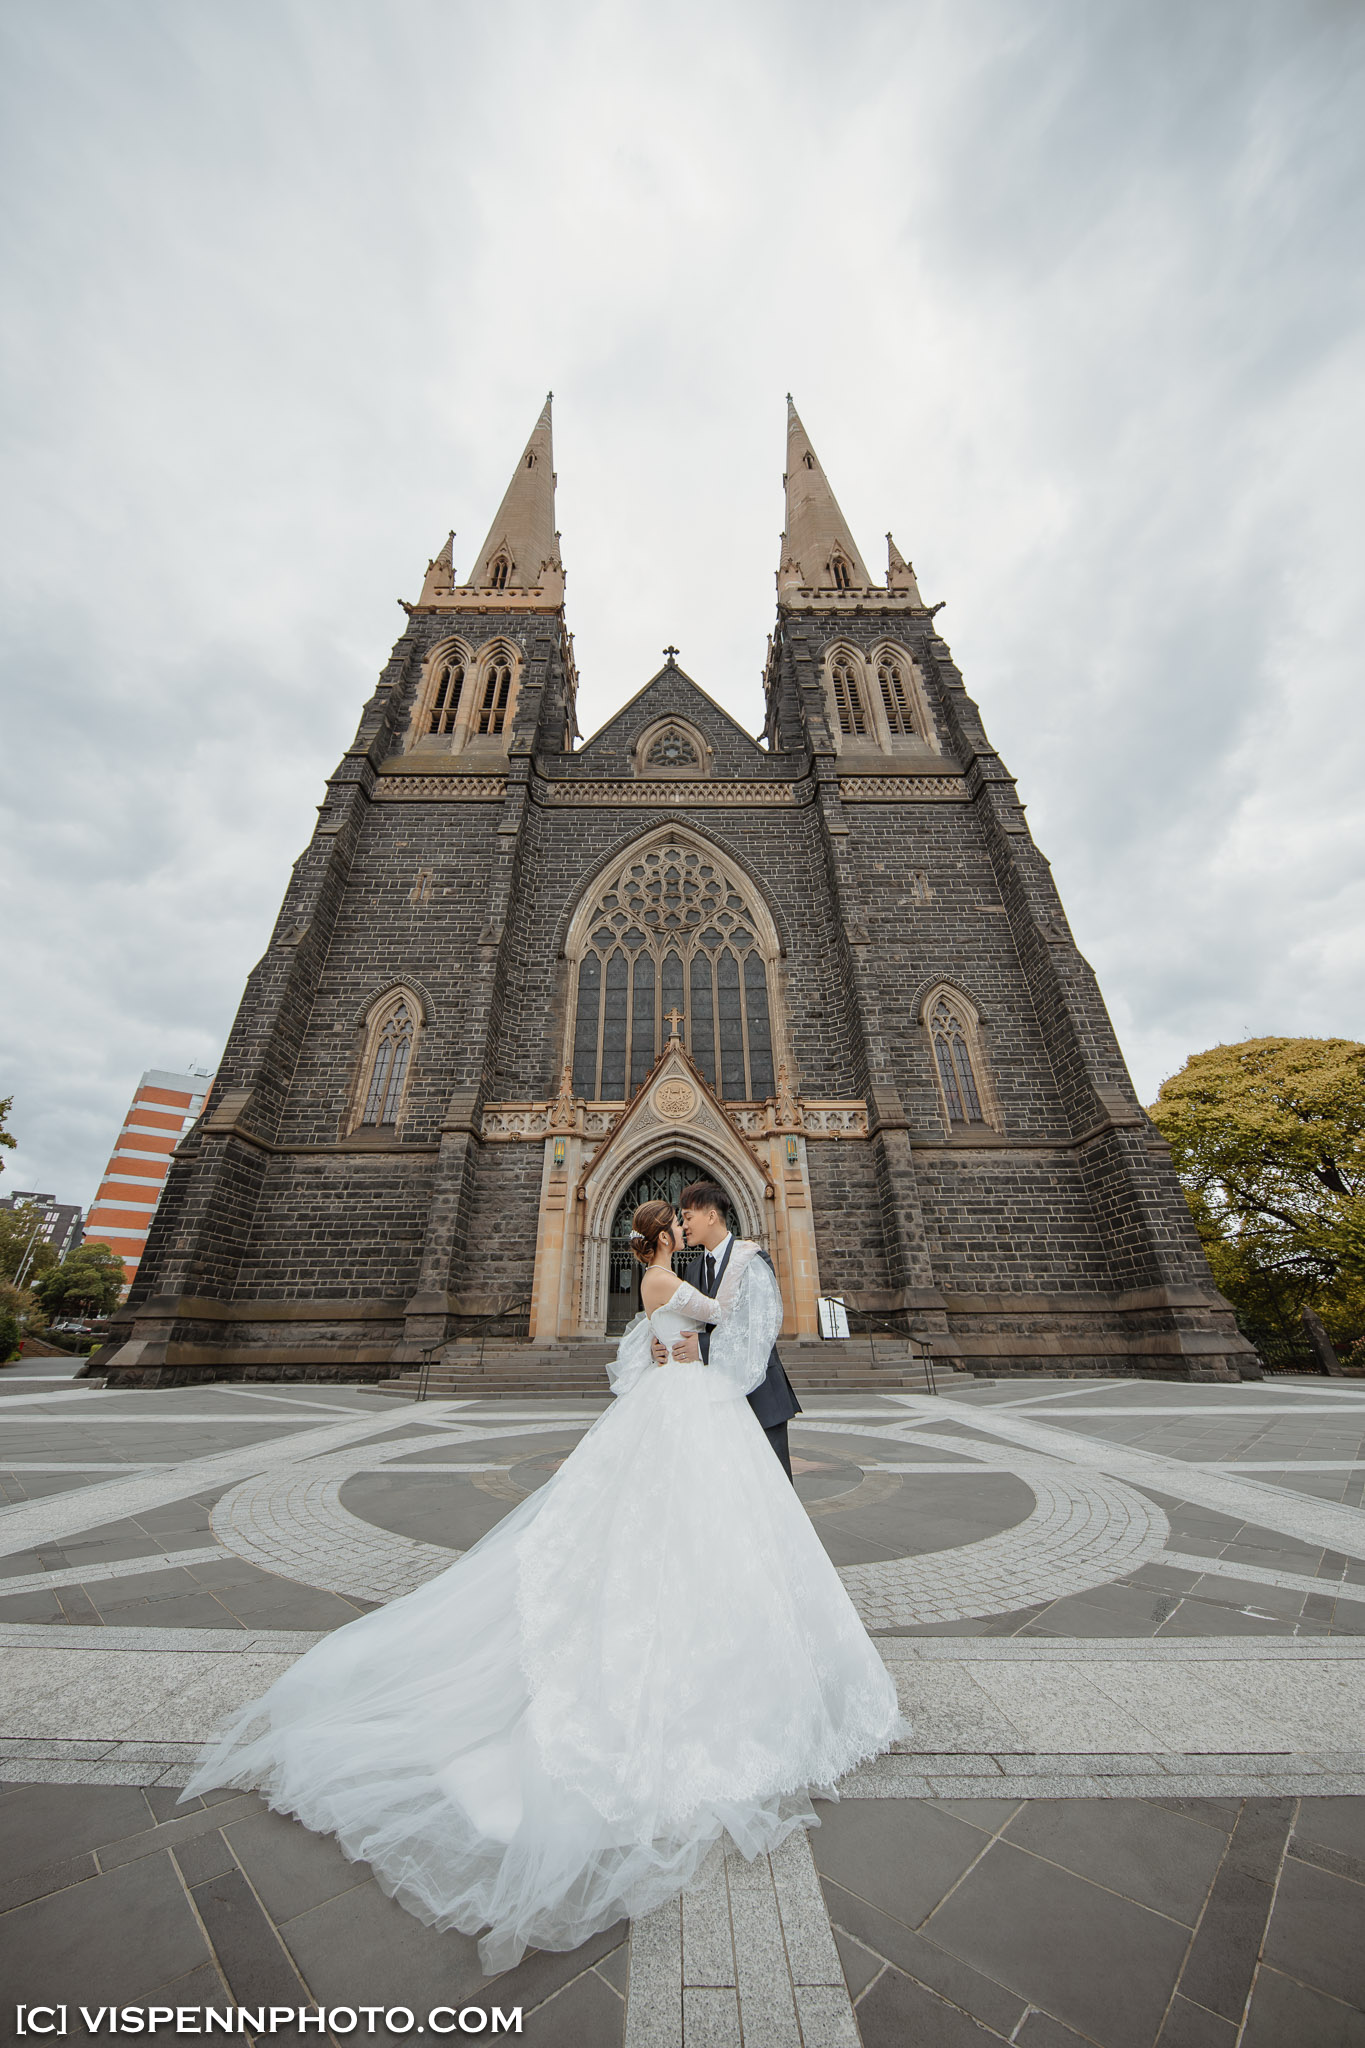 PRE WEDDING Photography Melbourne GiGi 5106 EOSR ZHPENN